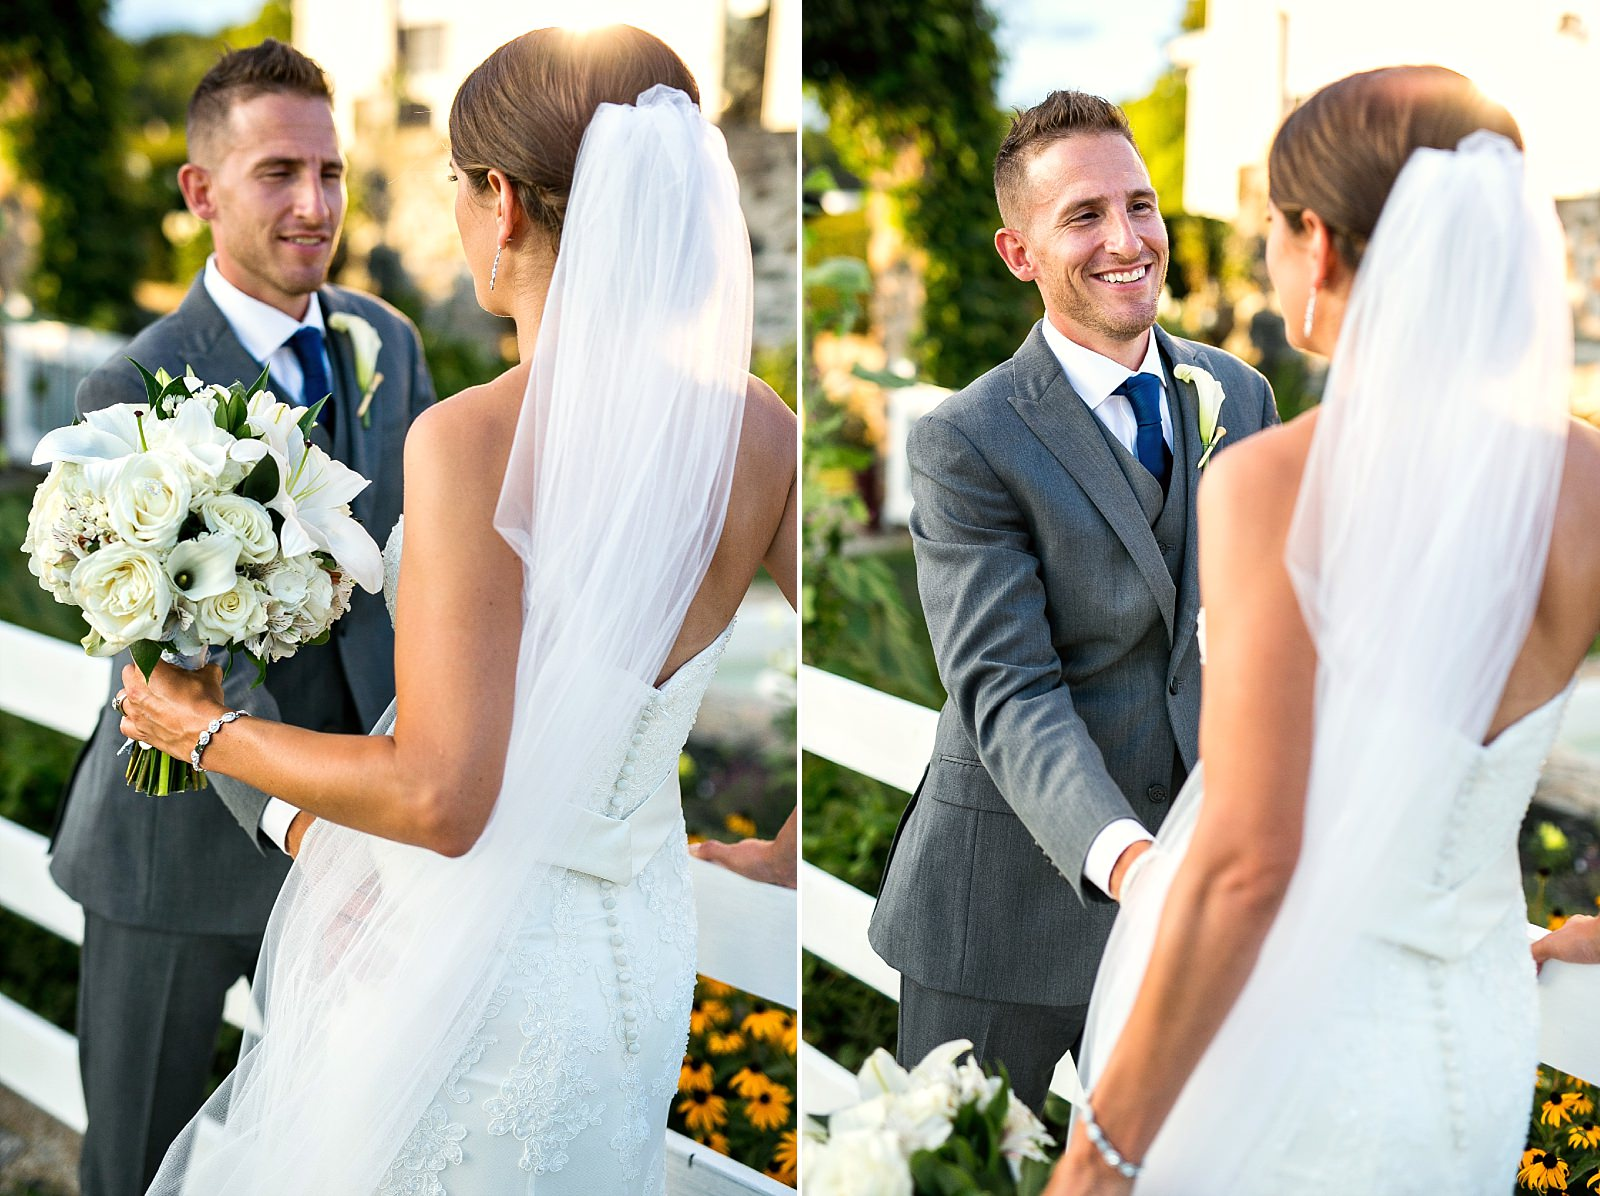 CT_Wedding_Photographer_LiNa_Wed_54.jpg